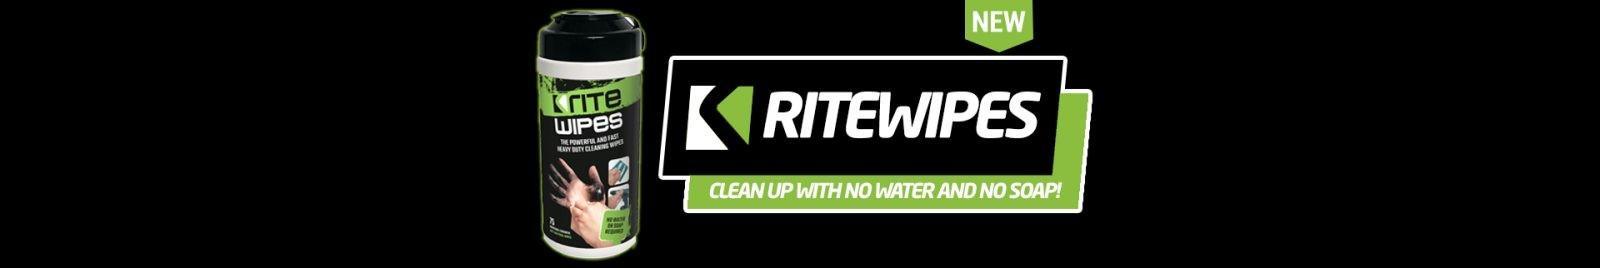 industrial wet wipes